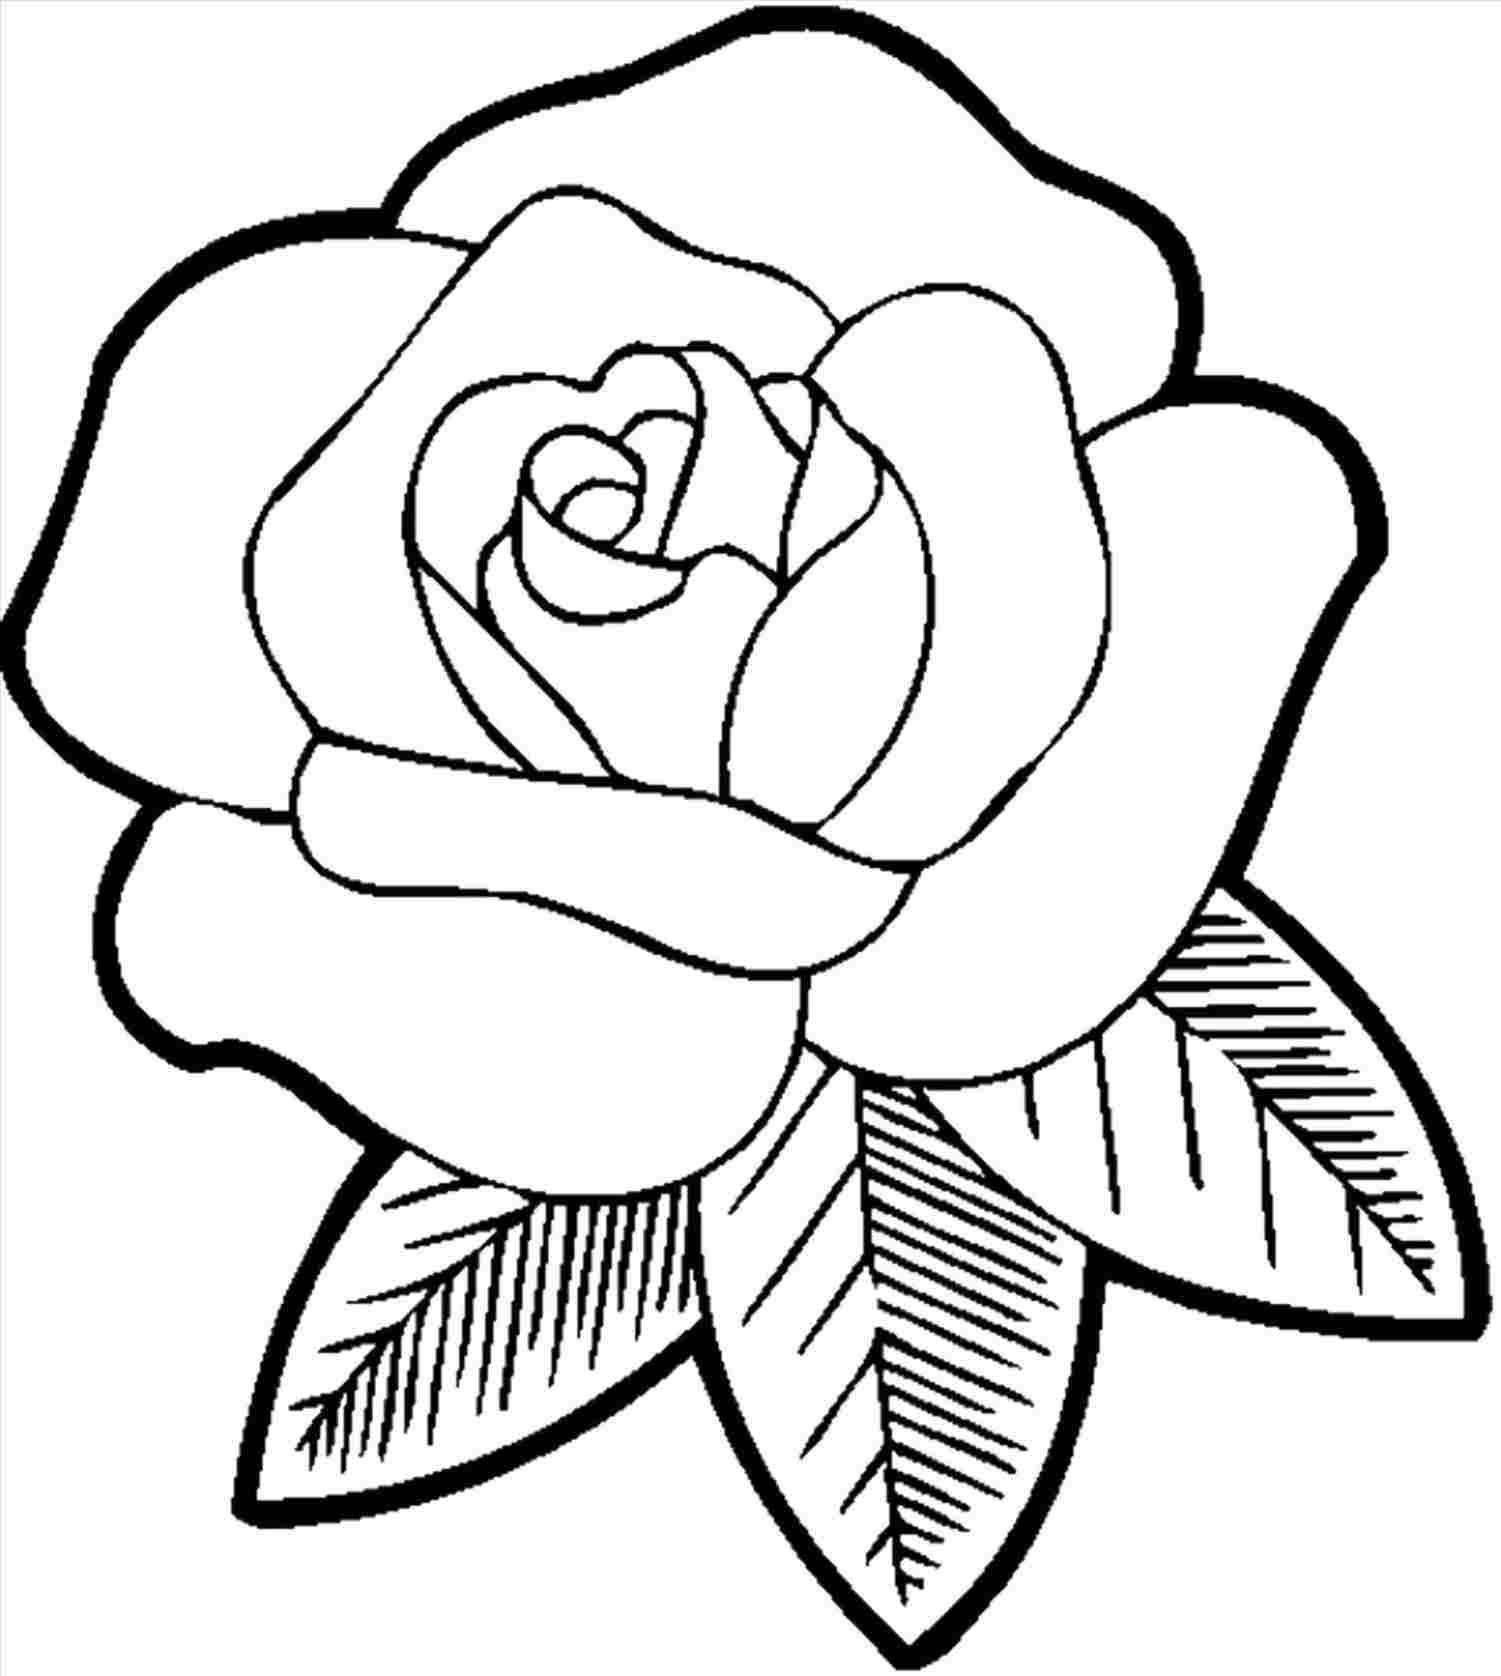 1501x1676 Simple Rose Drawings In Pencil